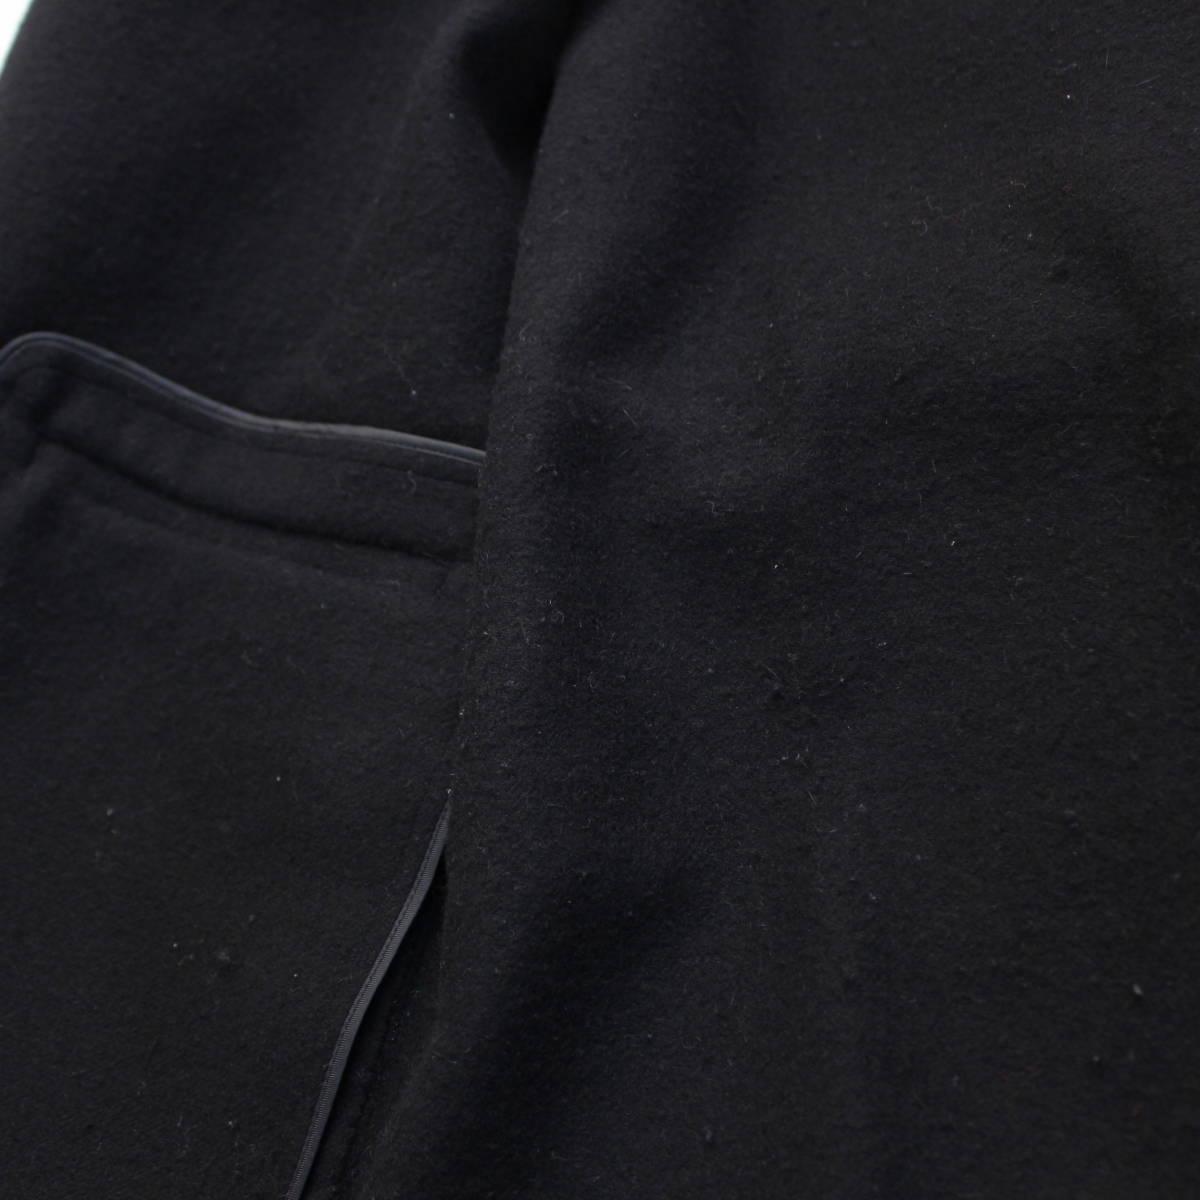 S'MAX MARA ANGORA BREND WOOL BELTED FOODED COAT/エスマックスマーラアンゴラ混ウールベルテッドフーデッドコート_画像6